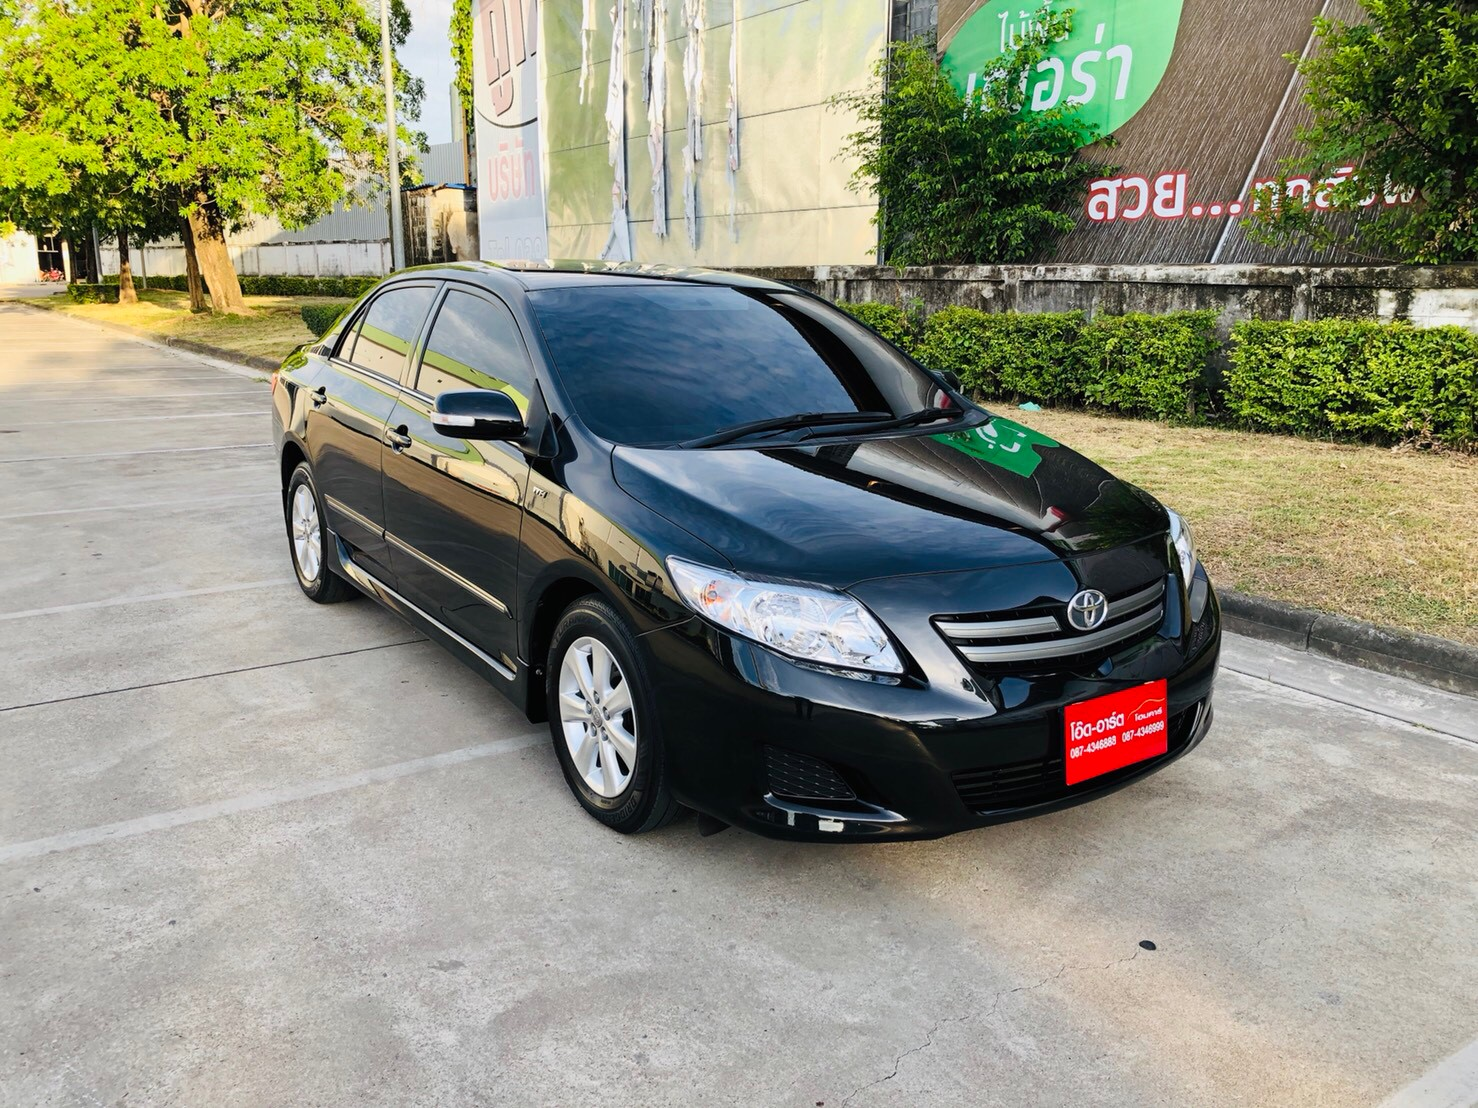 2008 Toyota Altis (Corolla) 1.6 G